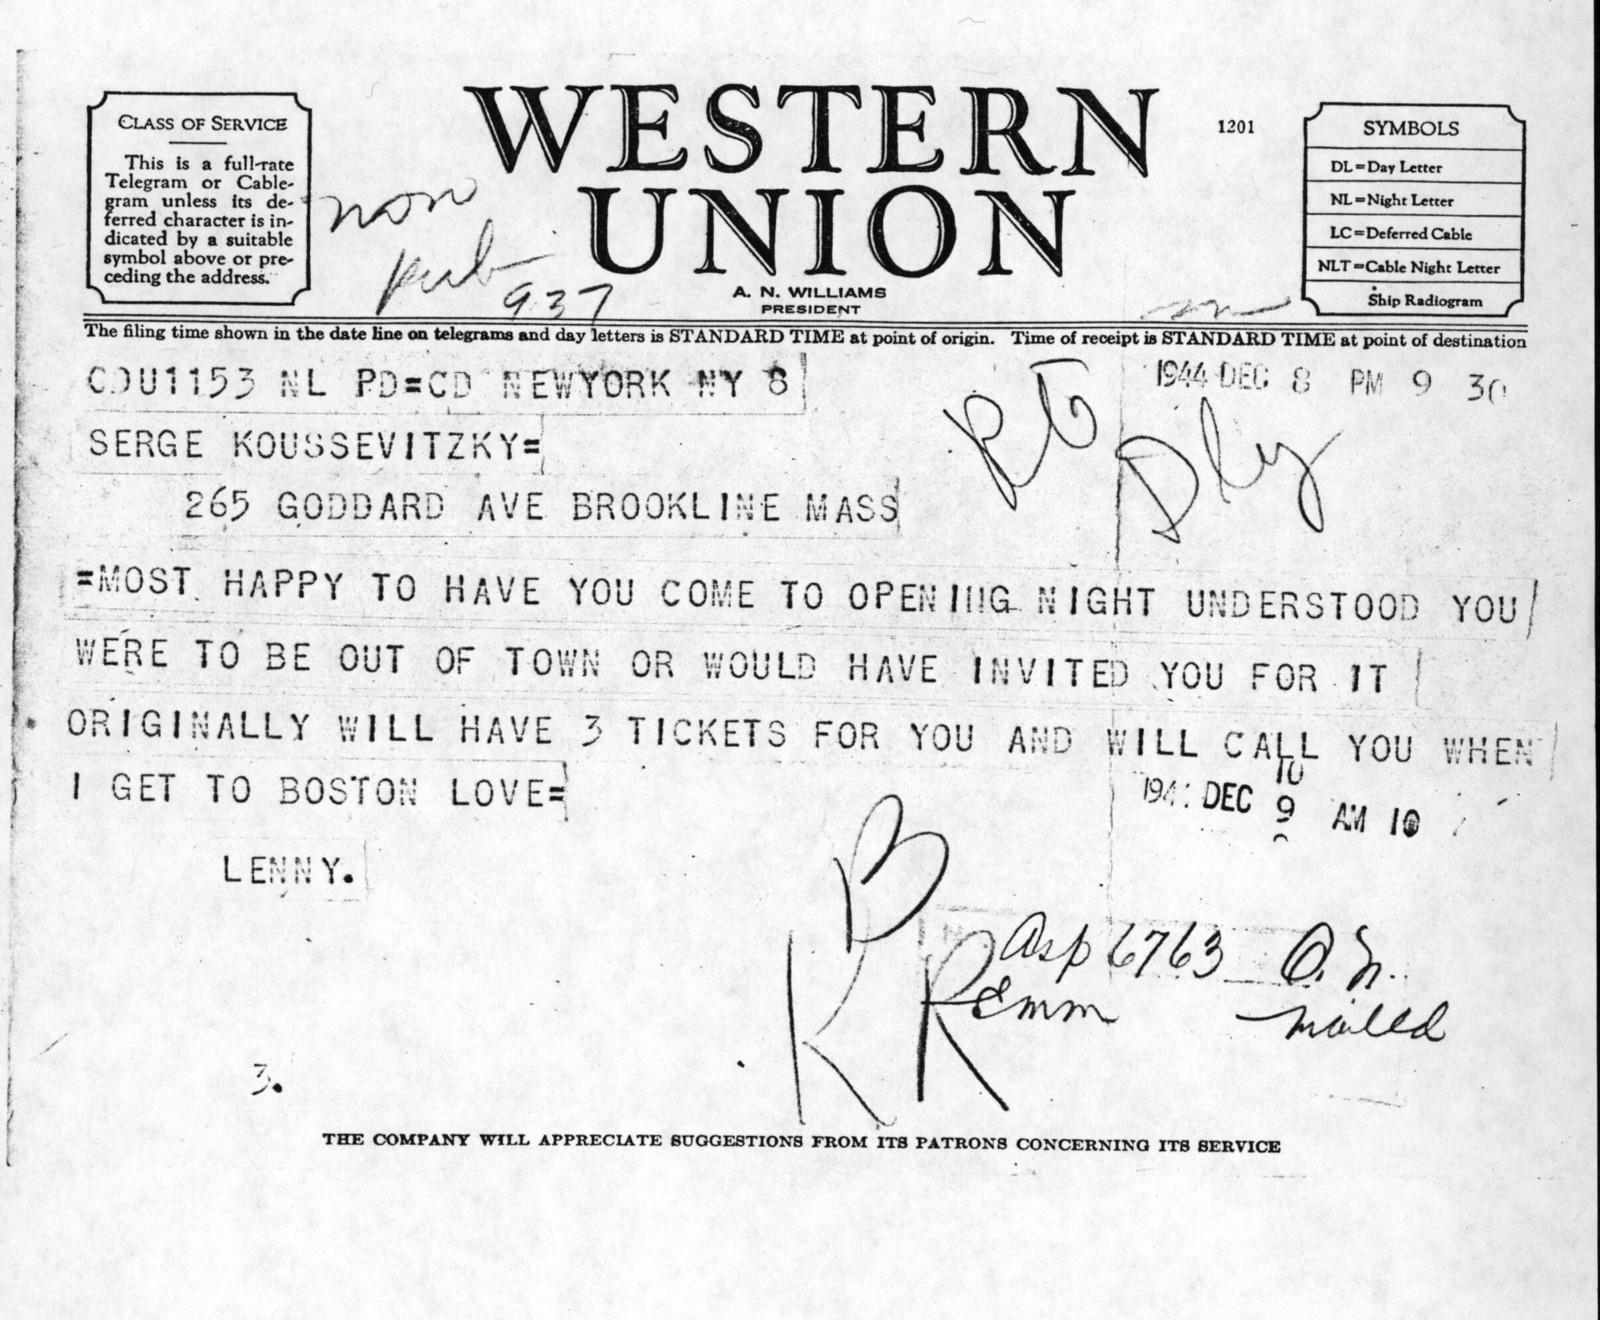 Letter from Leonard Bernstein to Serge Koussevitzky, December 8, 1944